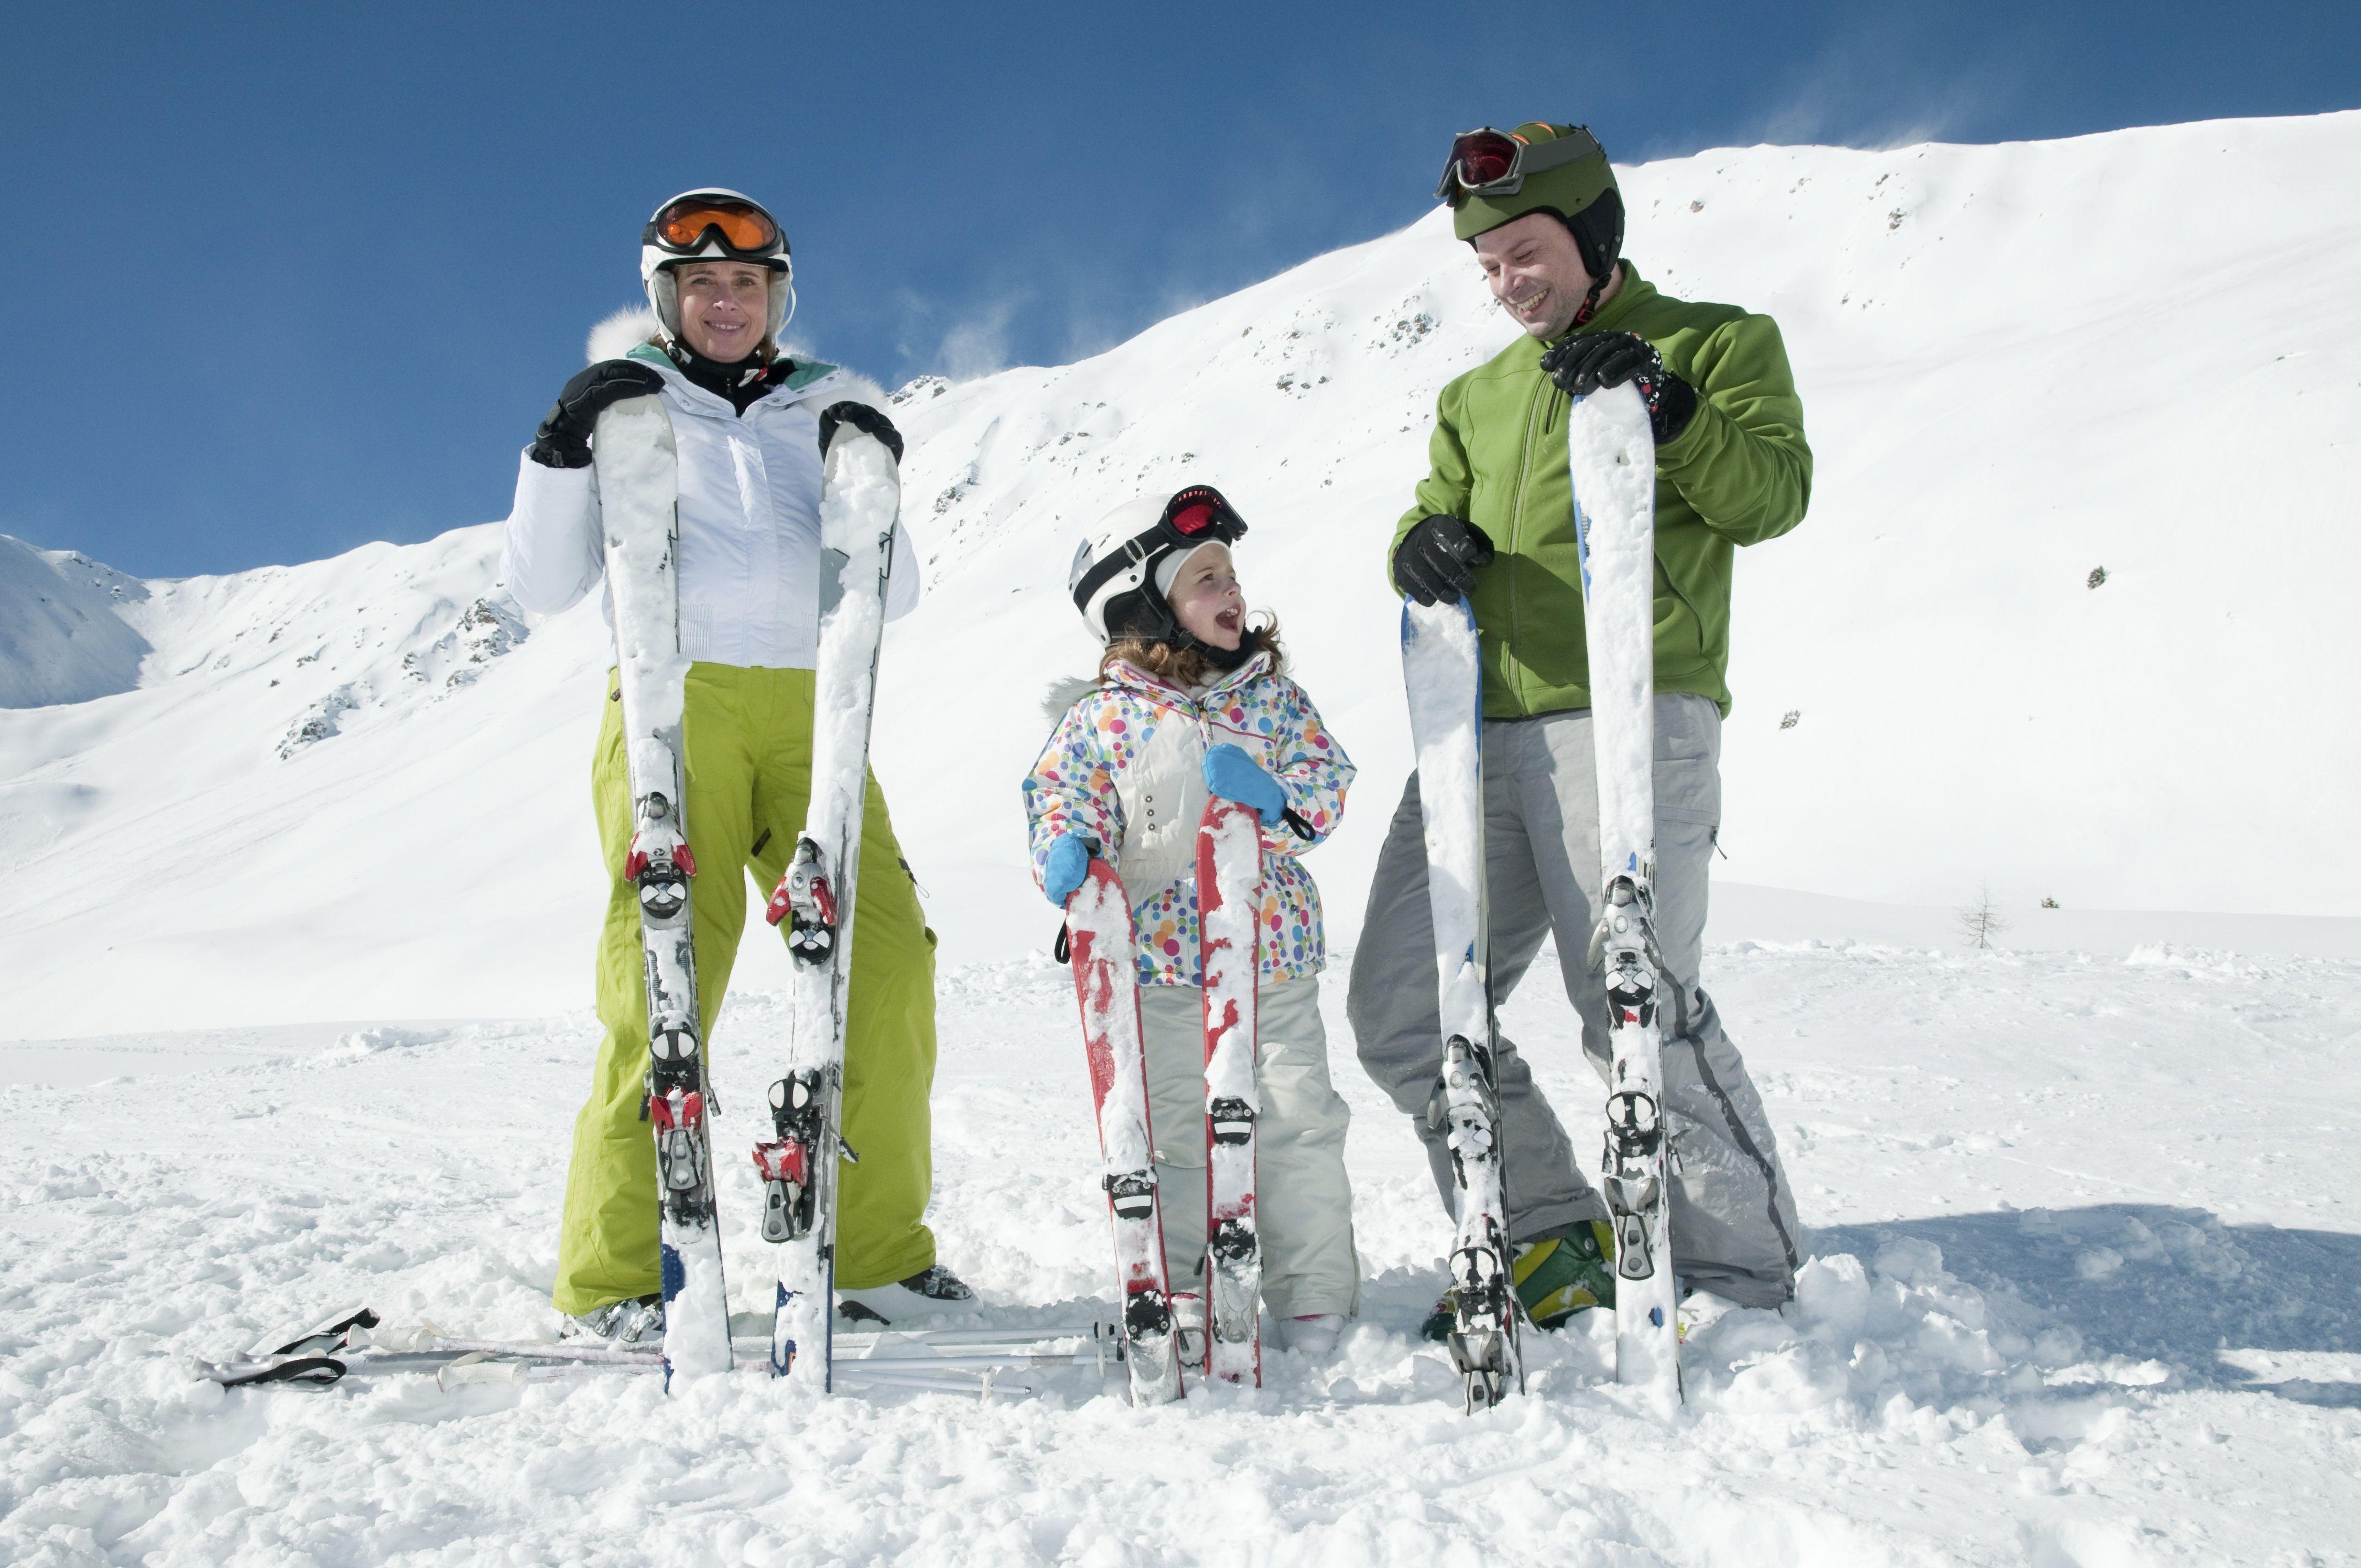 Mariánky Ski Complex in Mariánské Lázně